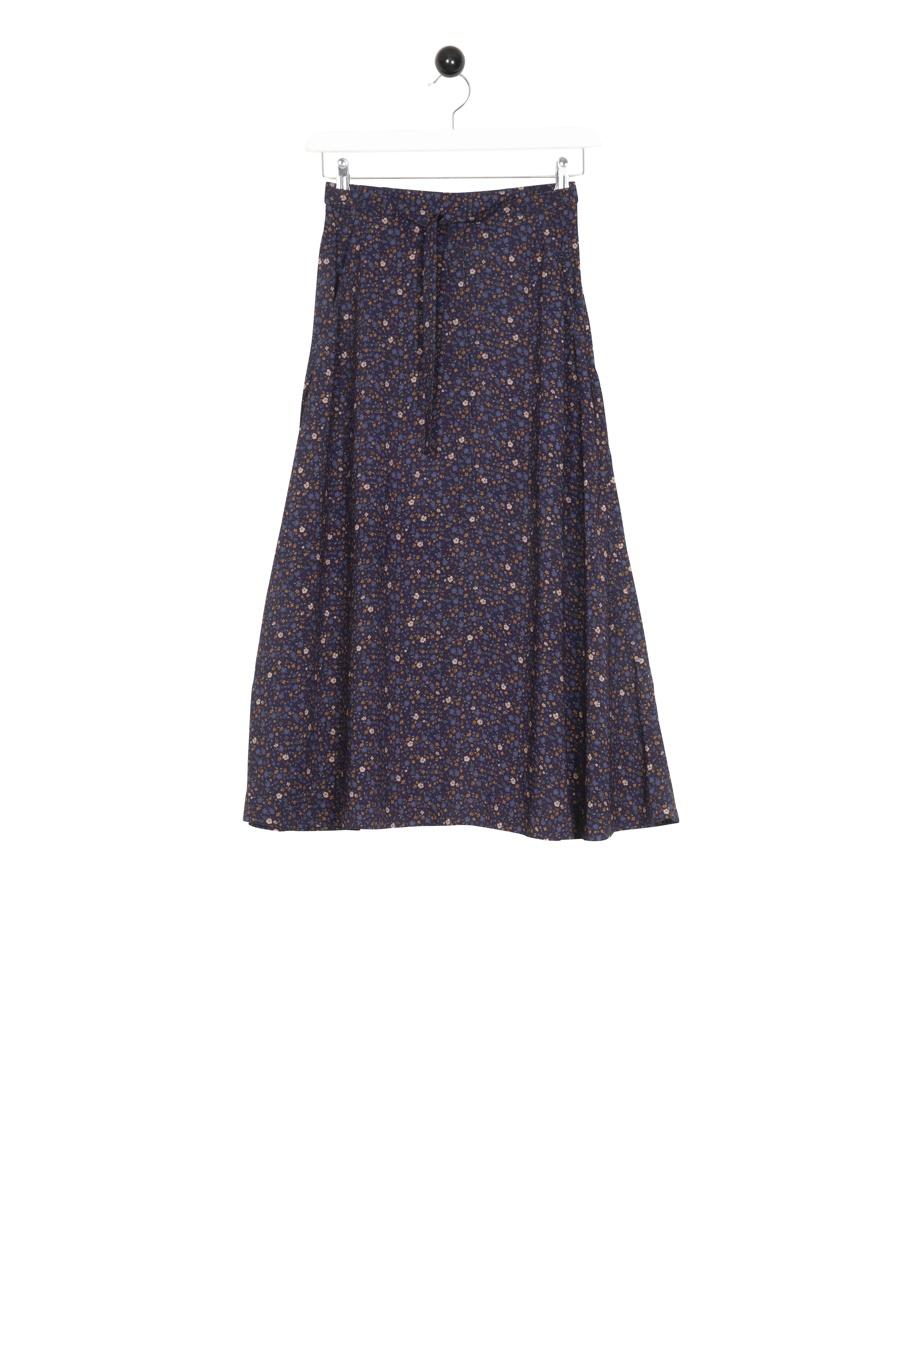 Simris Skirt